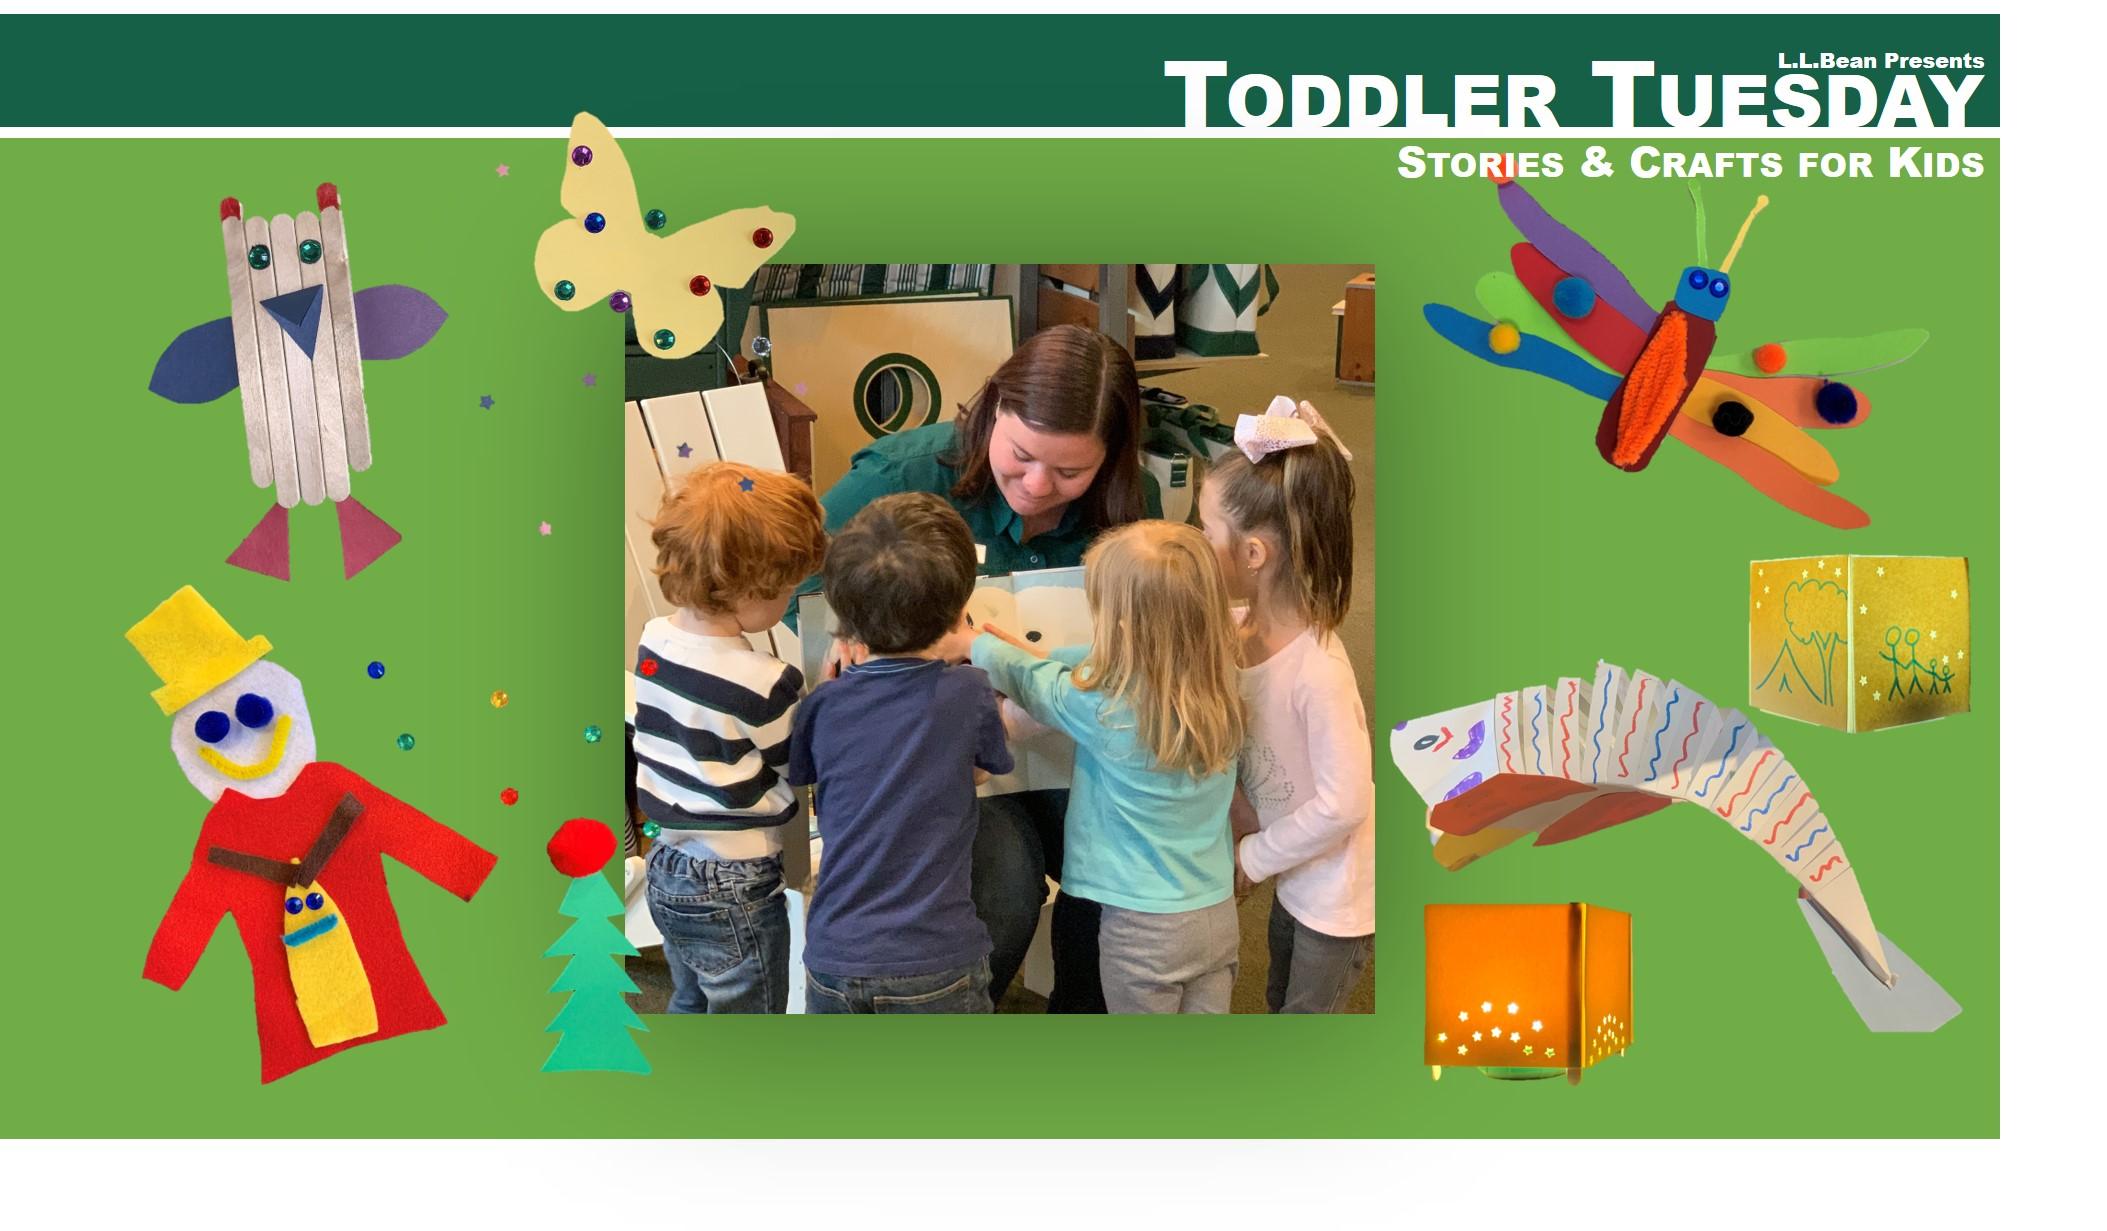 L.L.Bean Toddler Tuesday